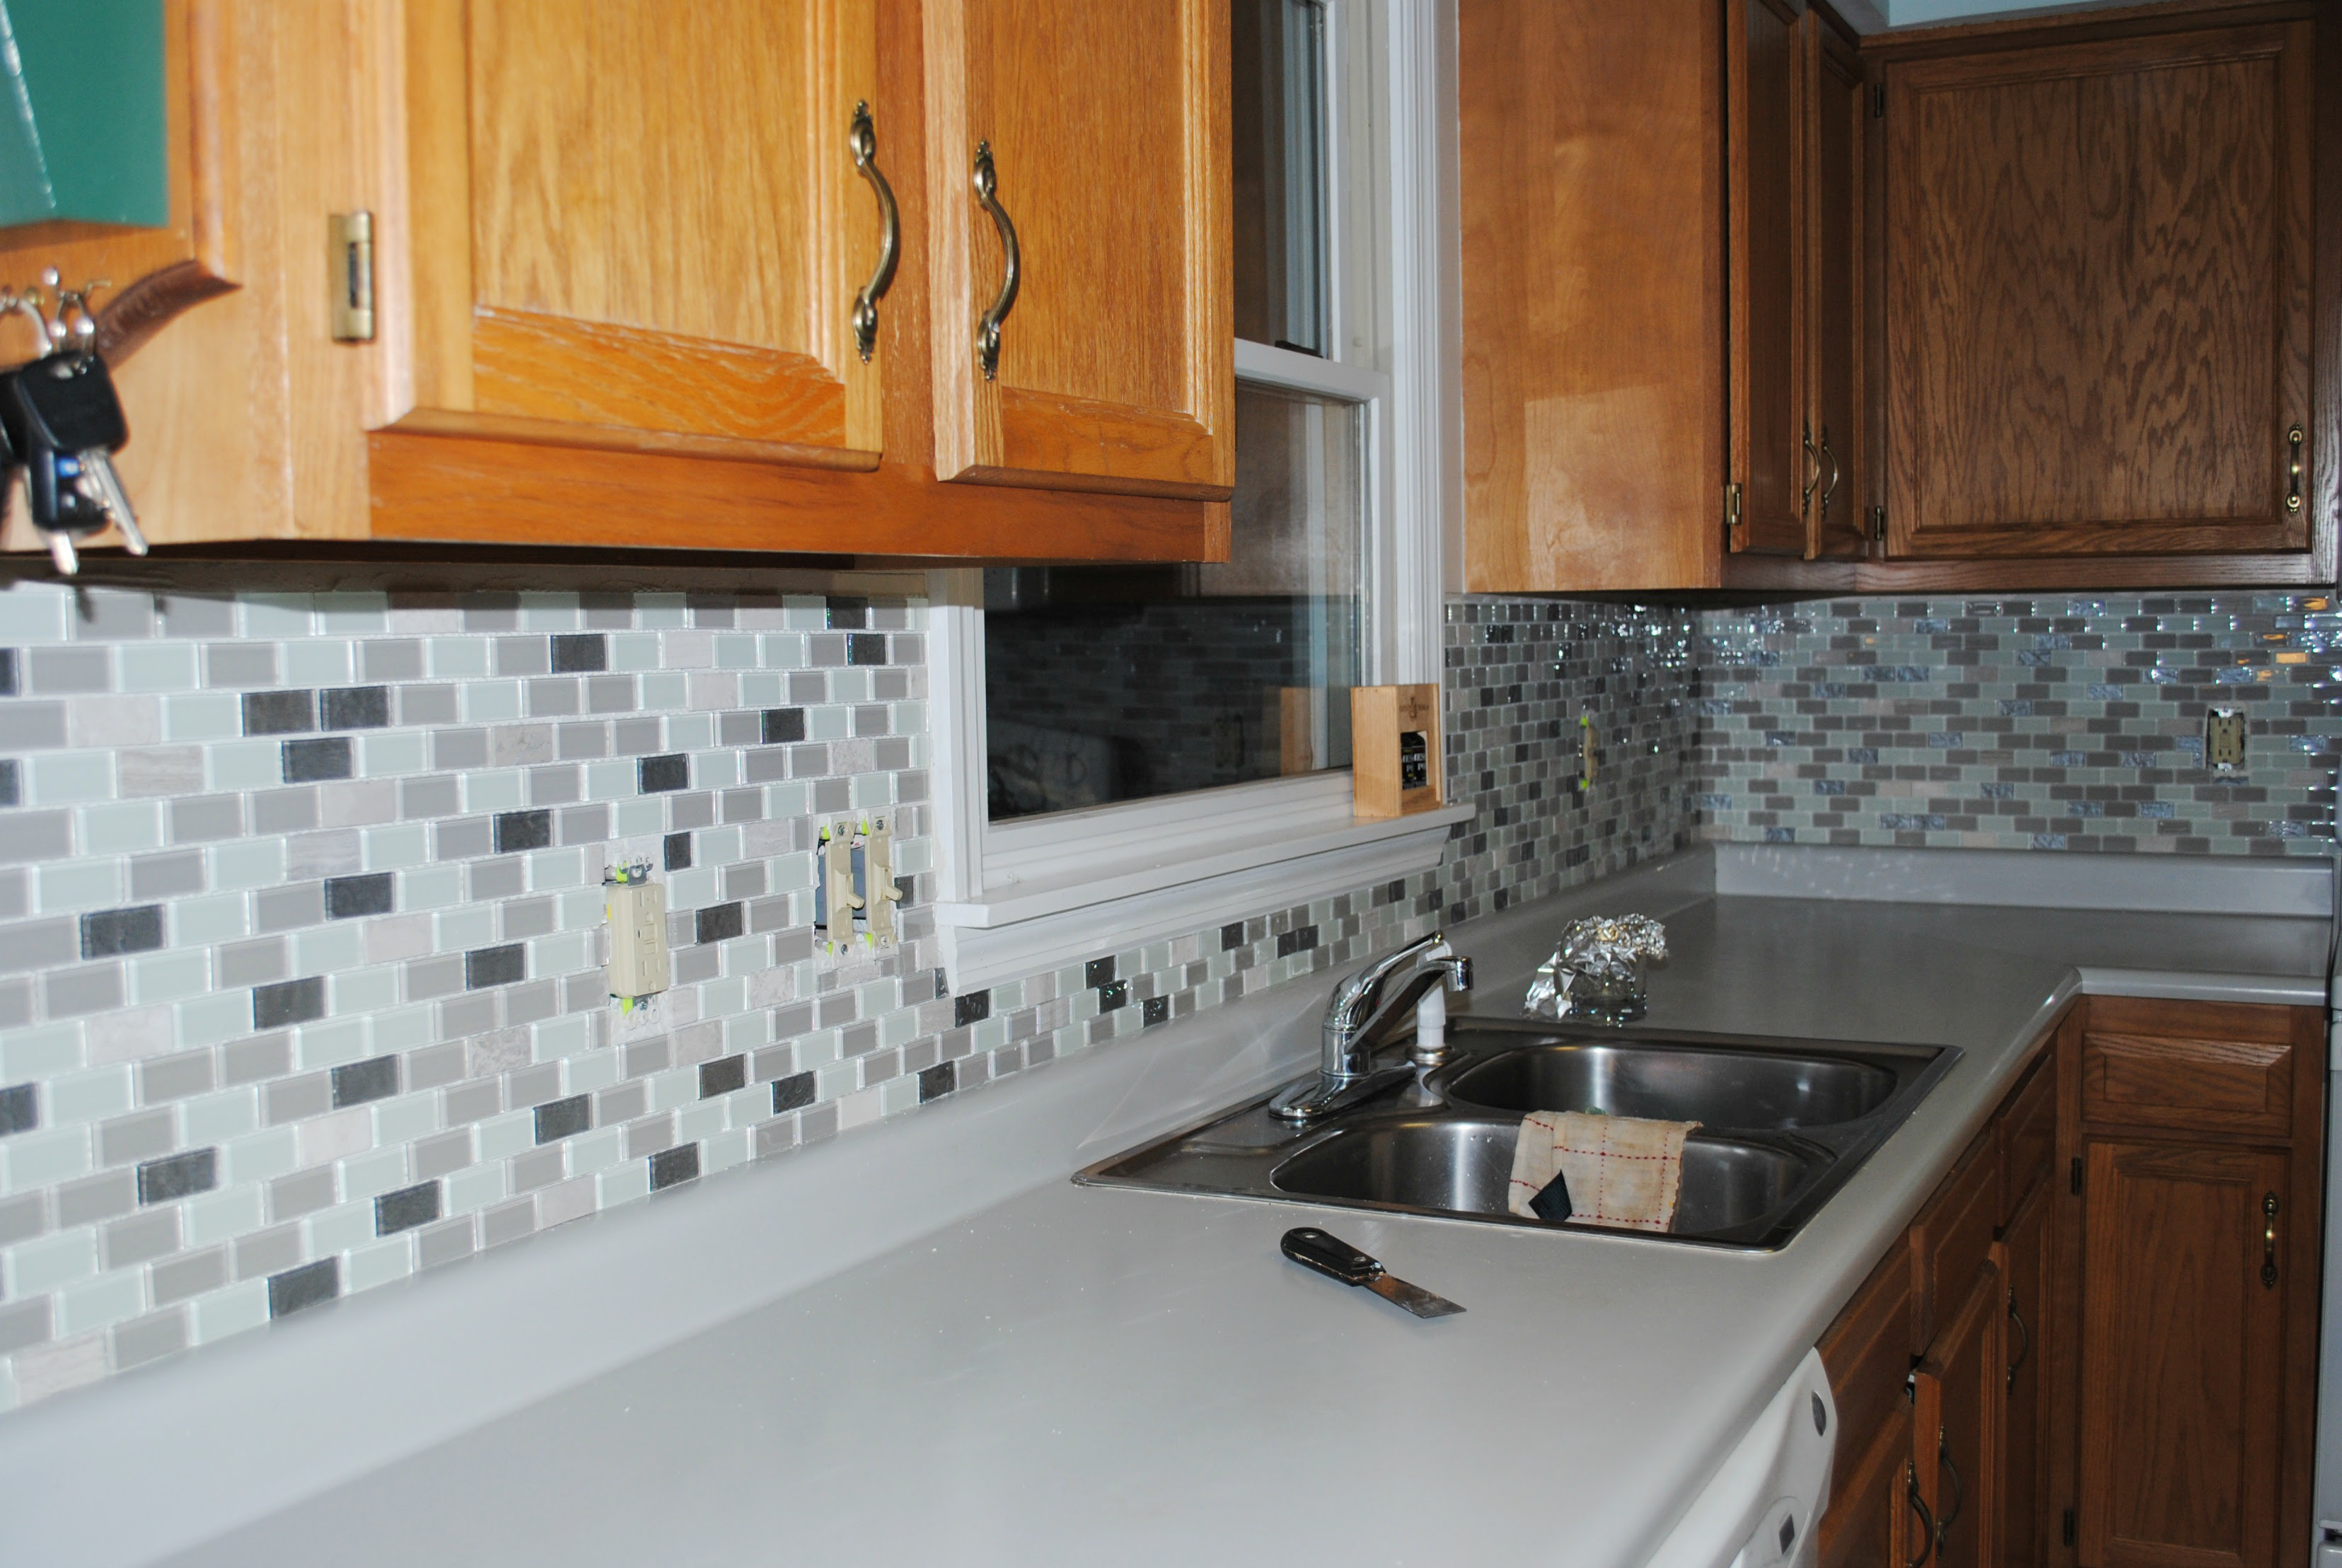 Groutless Kitchen Backsplash Home And